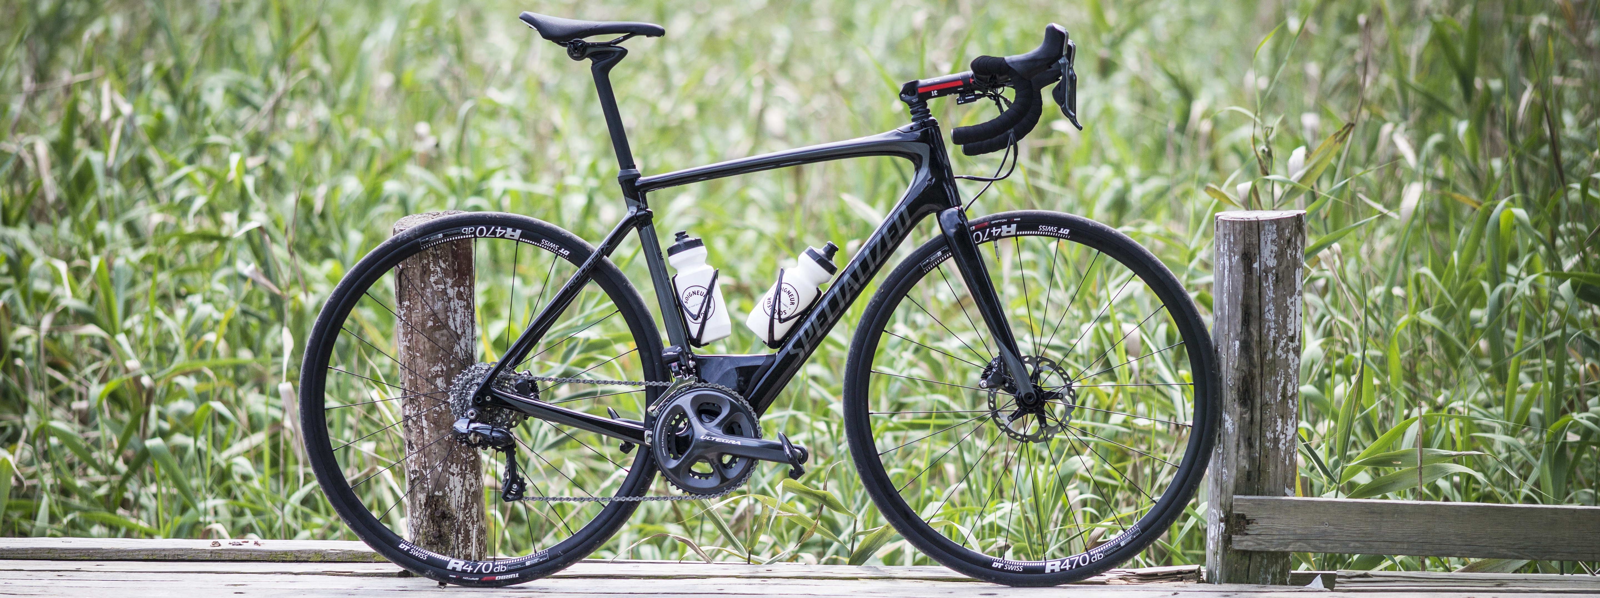 Specialized Roubaix Expert UDi2